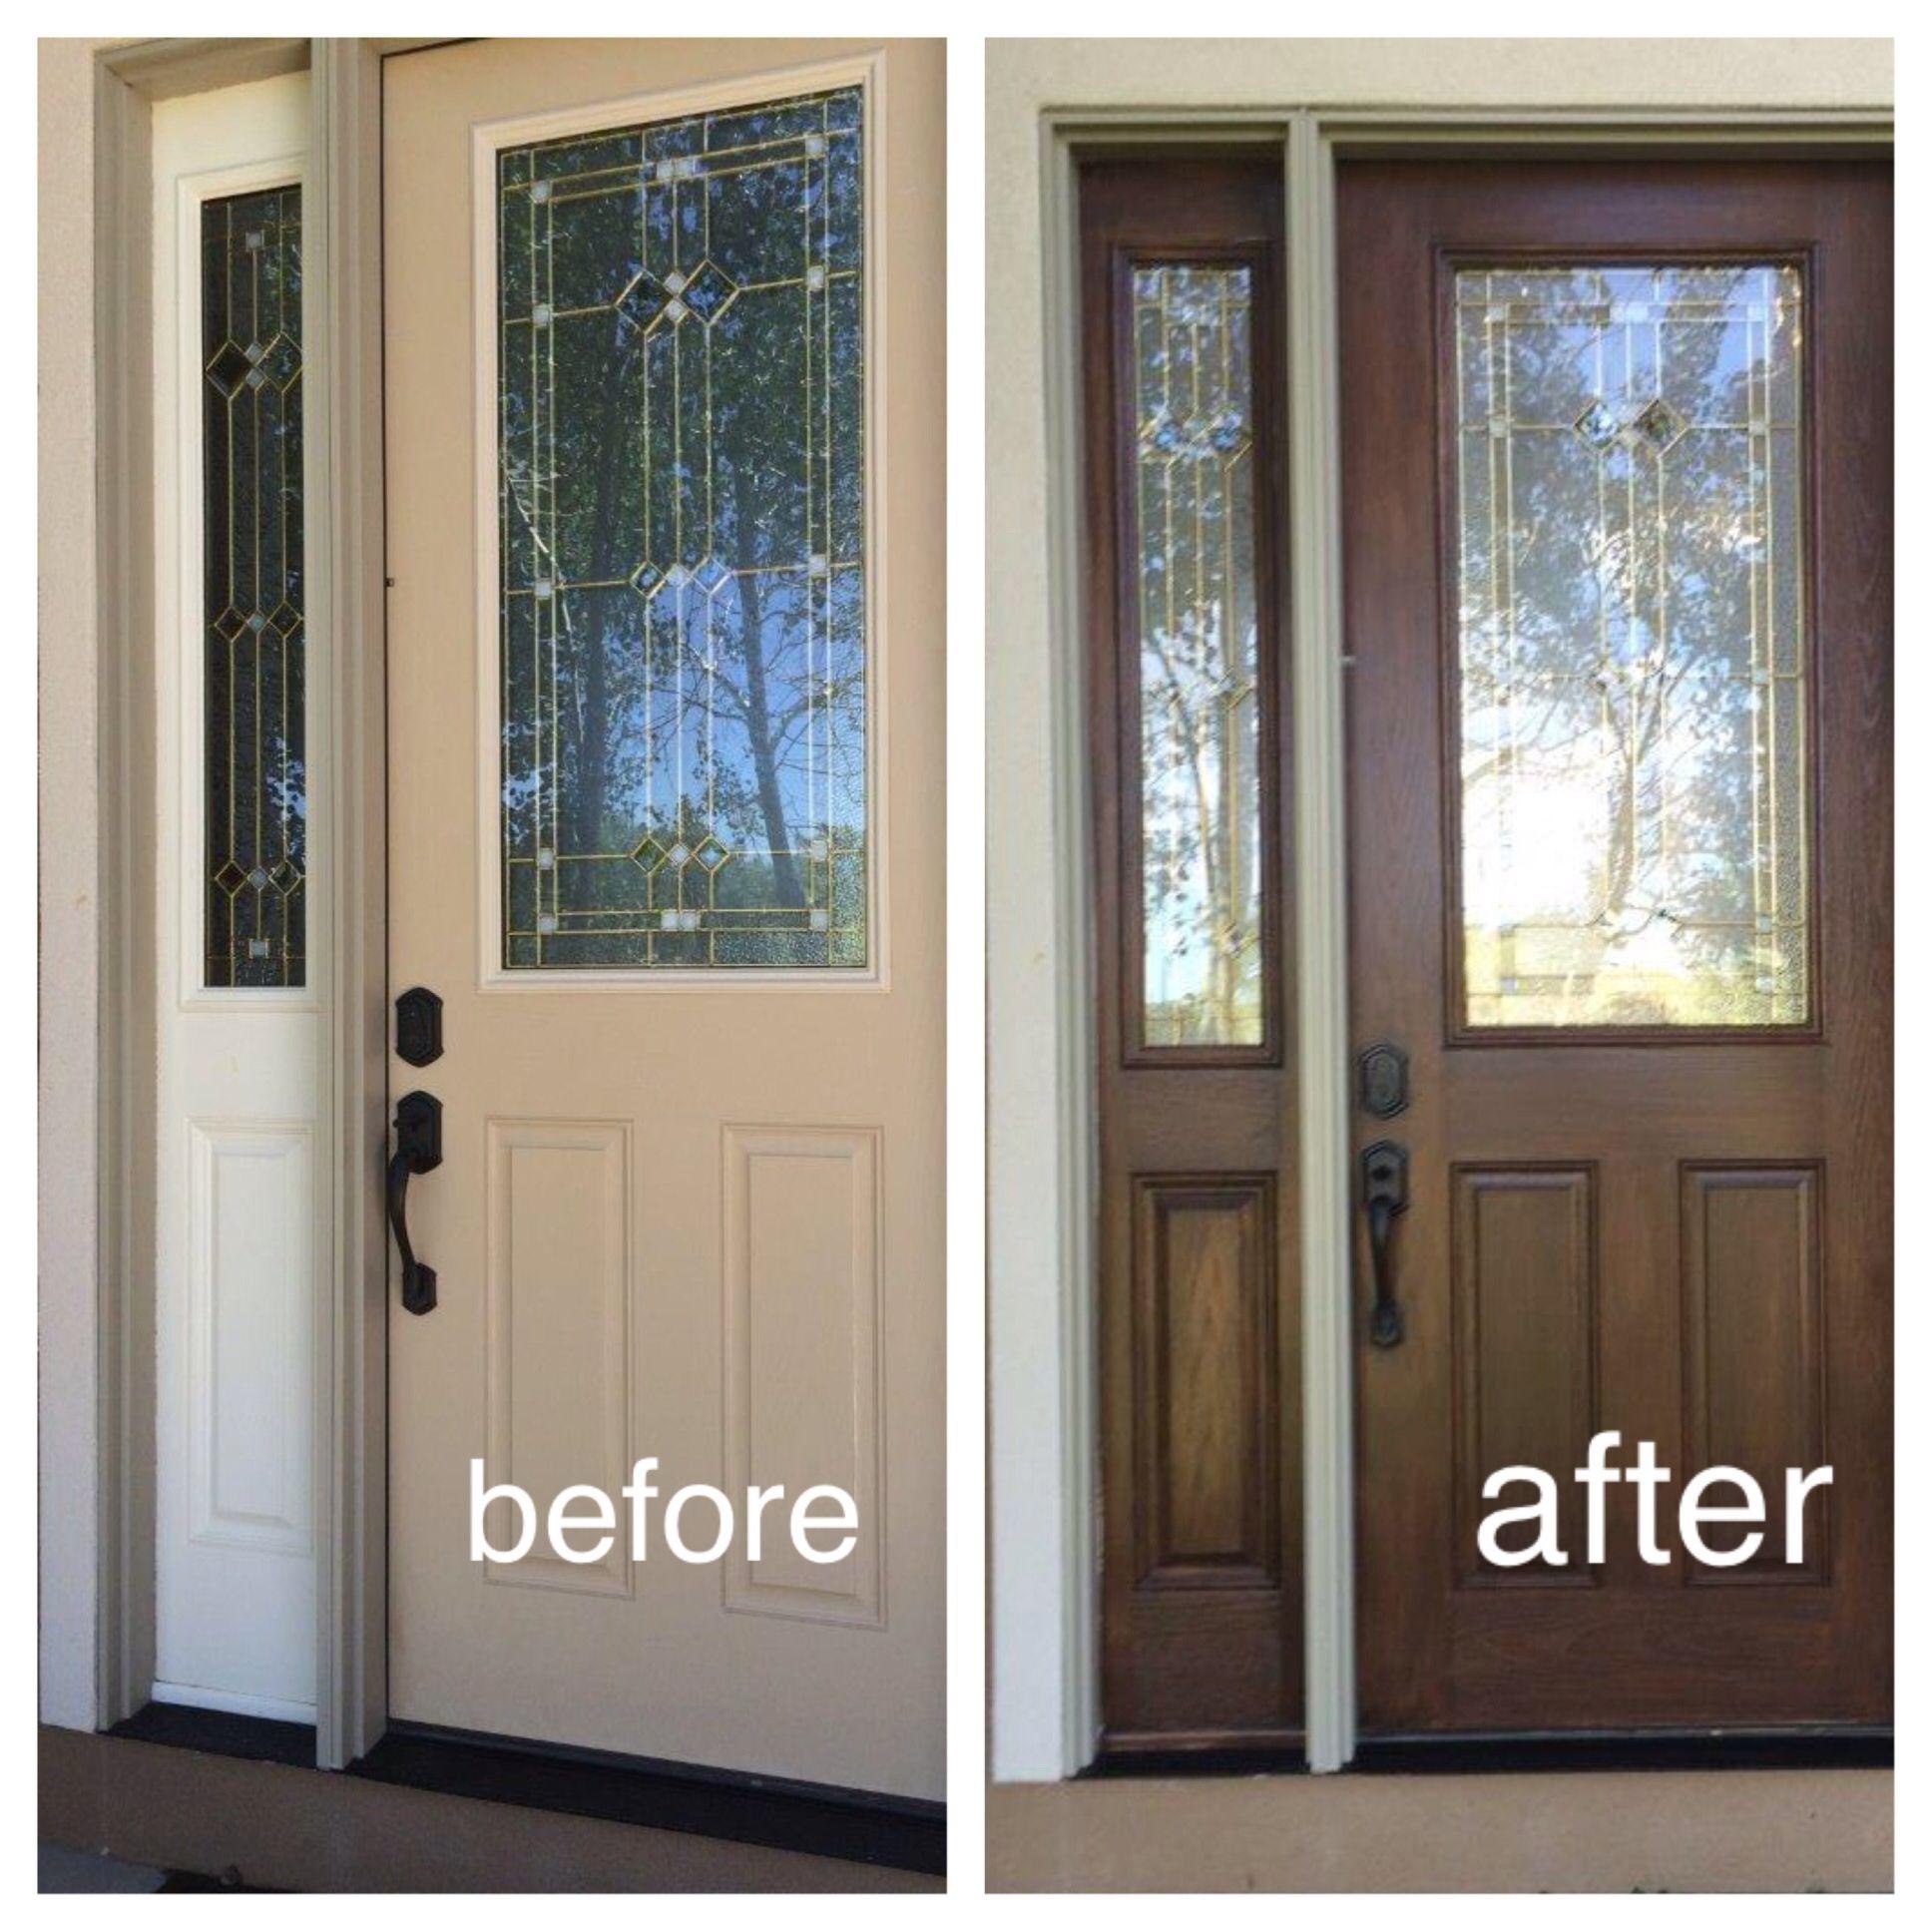 My Fiberglass Front Door Had Wood Grain So I Decided To Use Zar